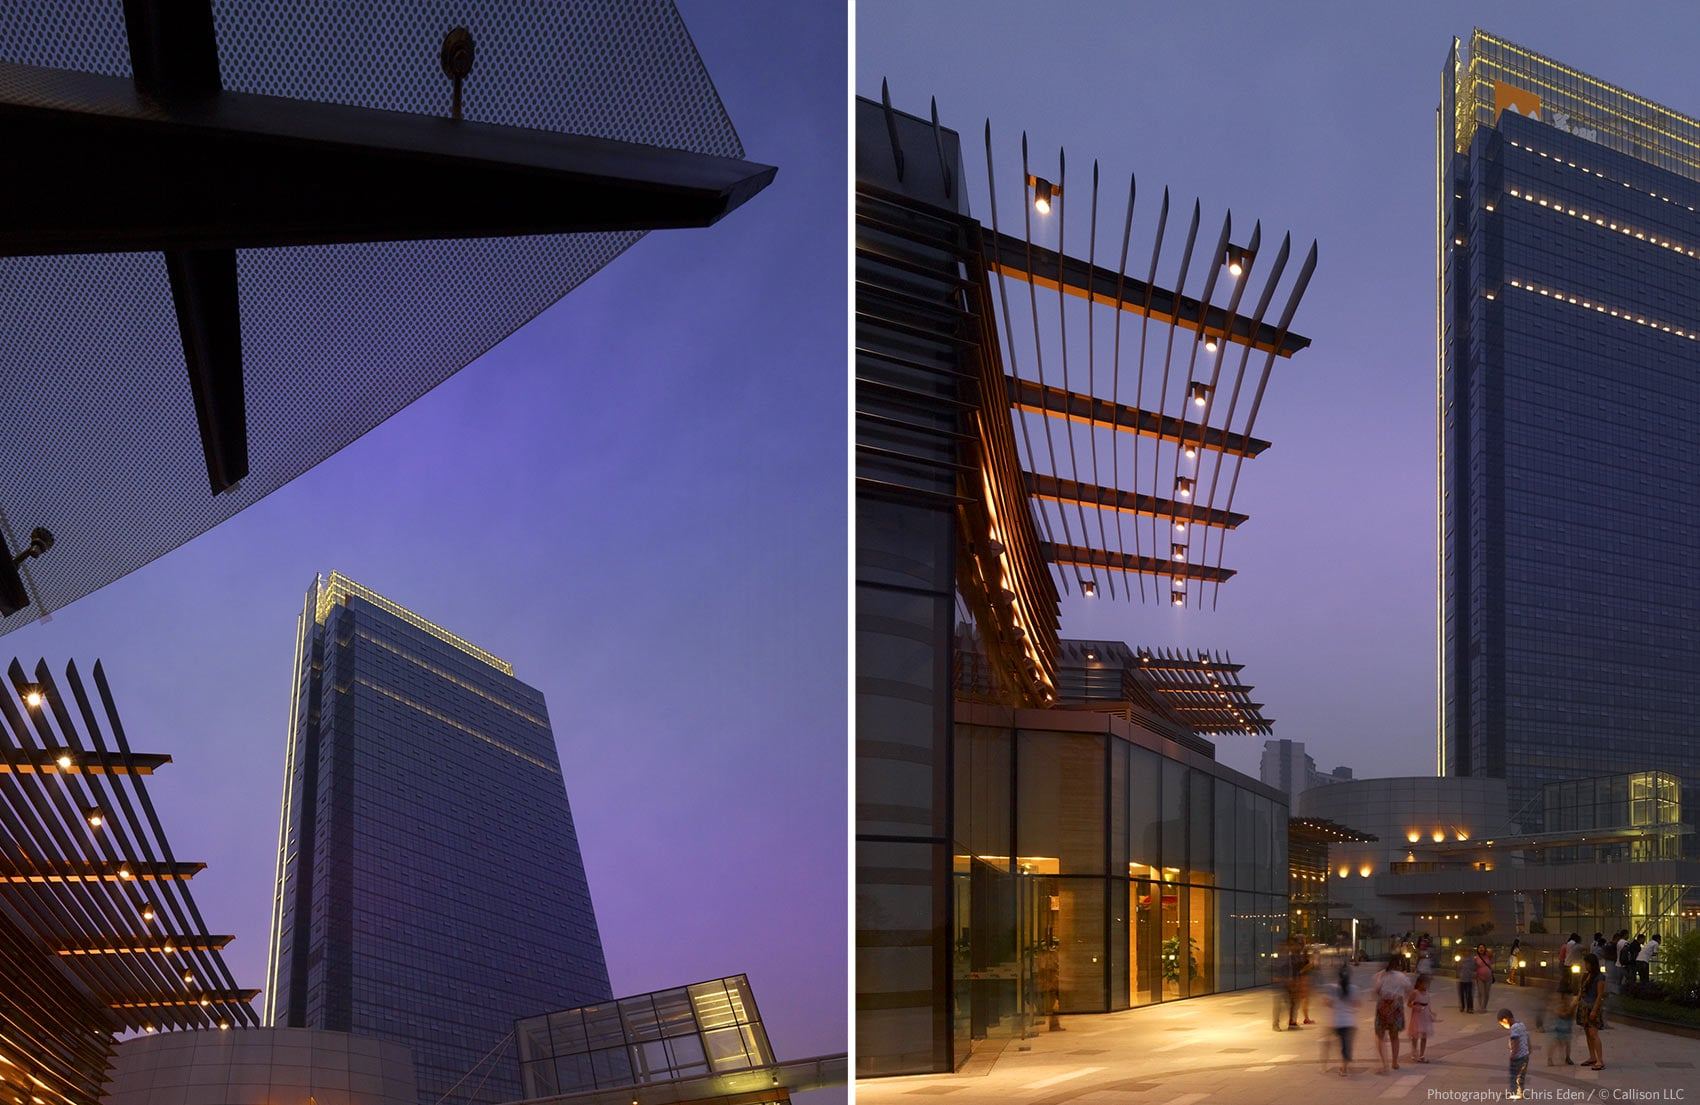 Mix C, Chengdu, China - High Rise tower, a key element